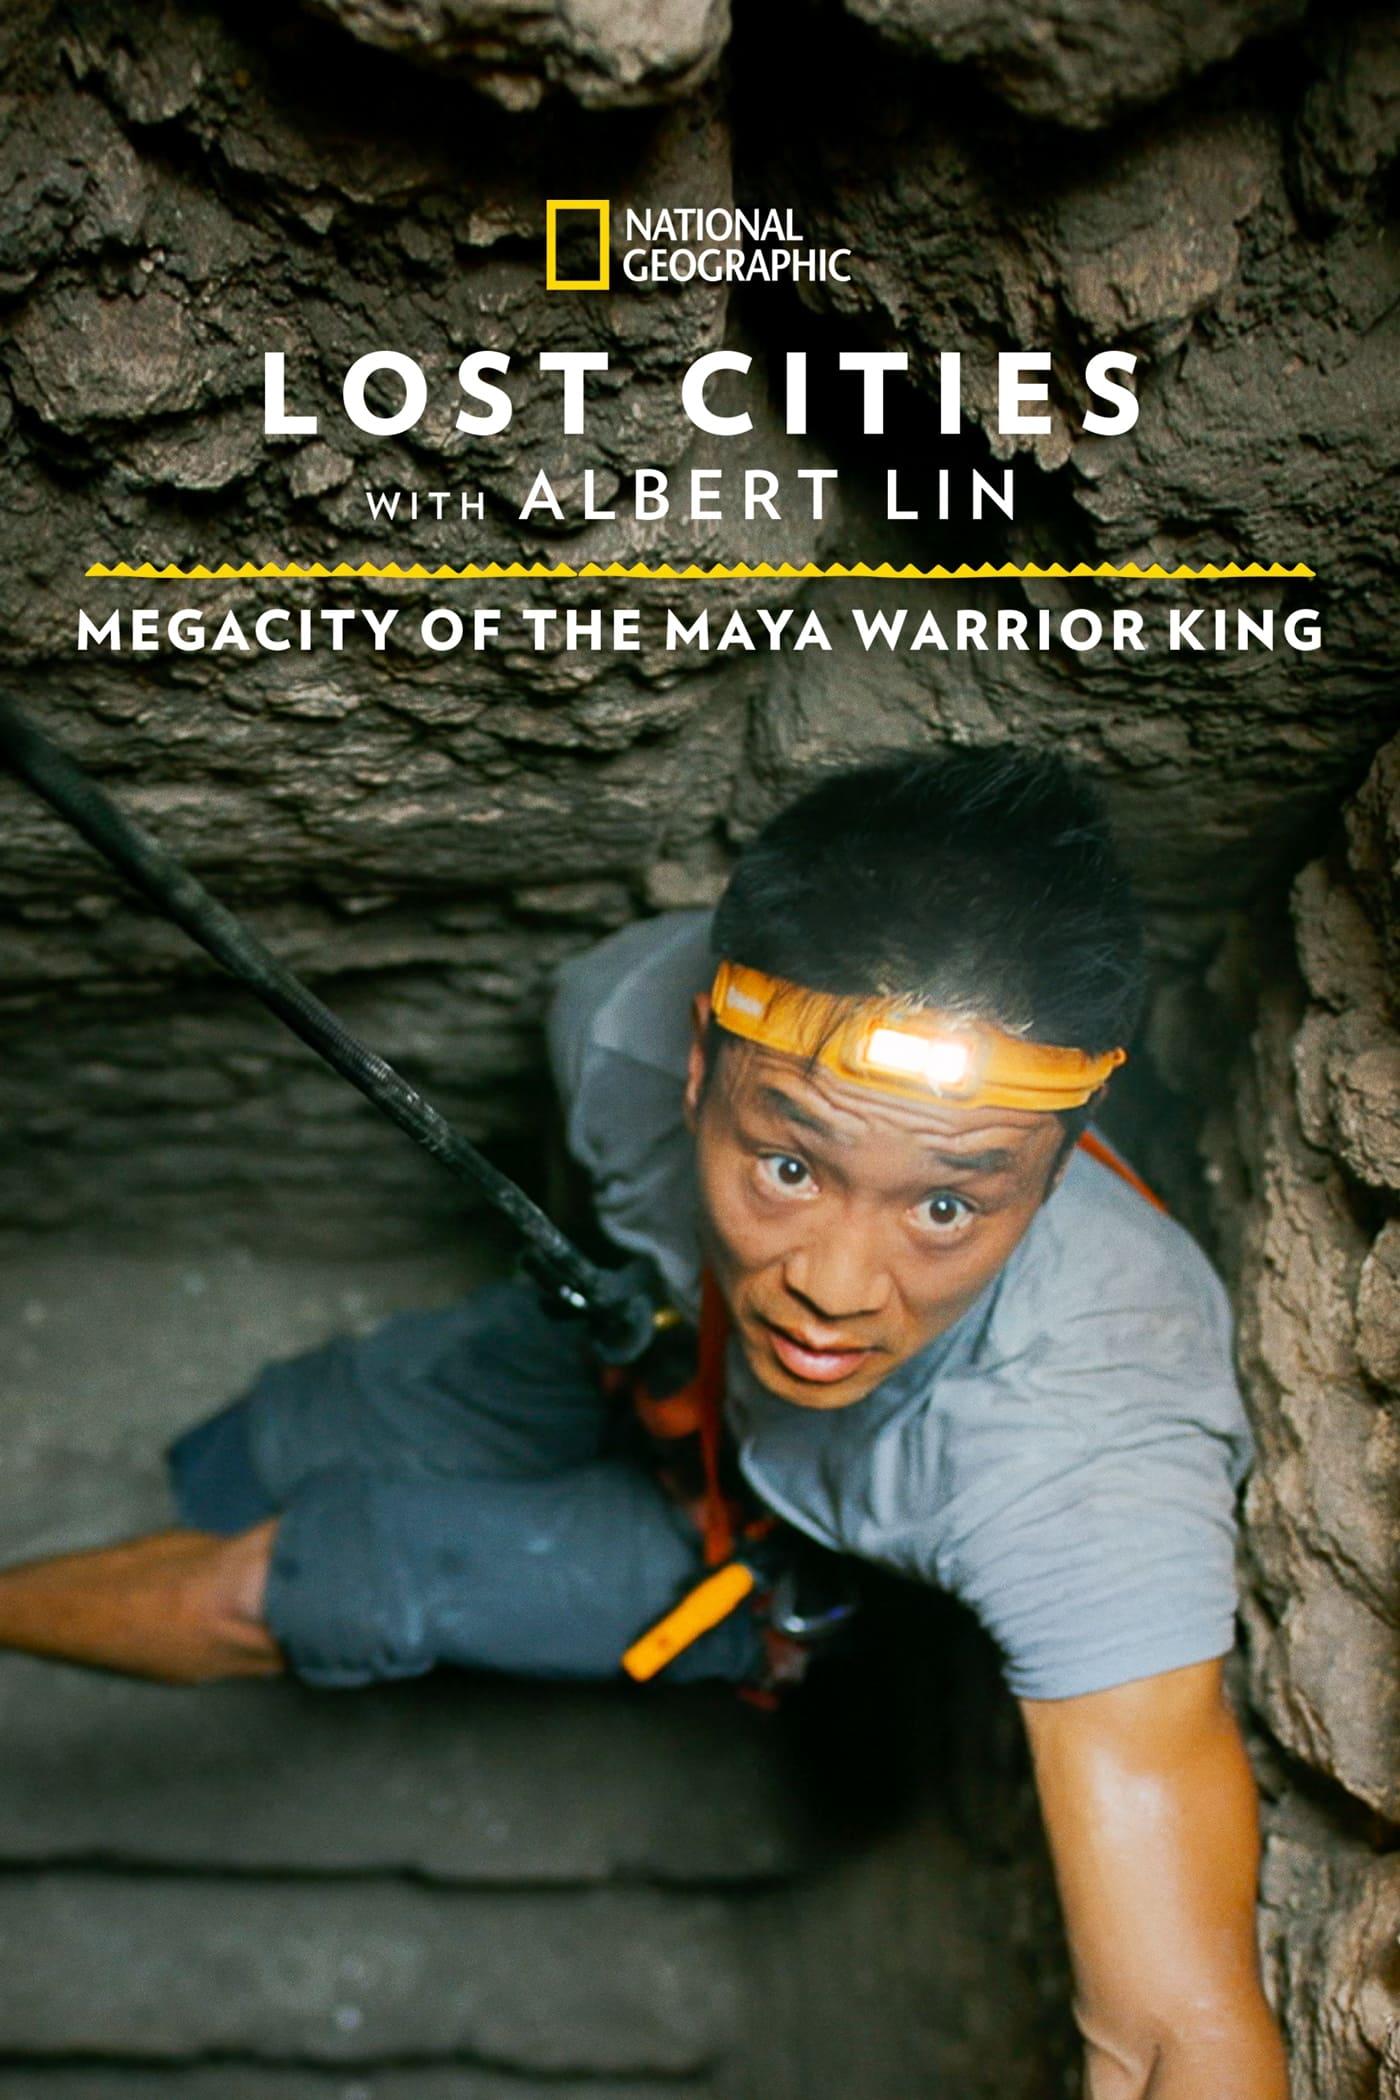 Lost Cities: Megacity of the Maya Warrior King (2021)